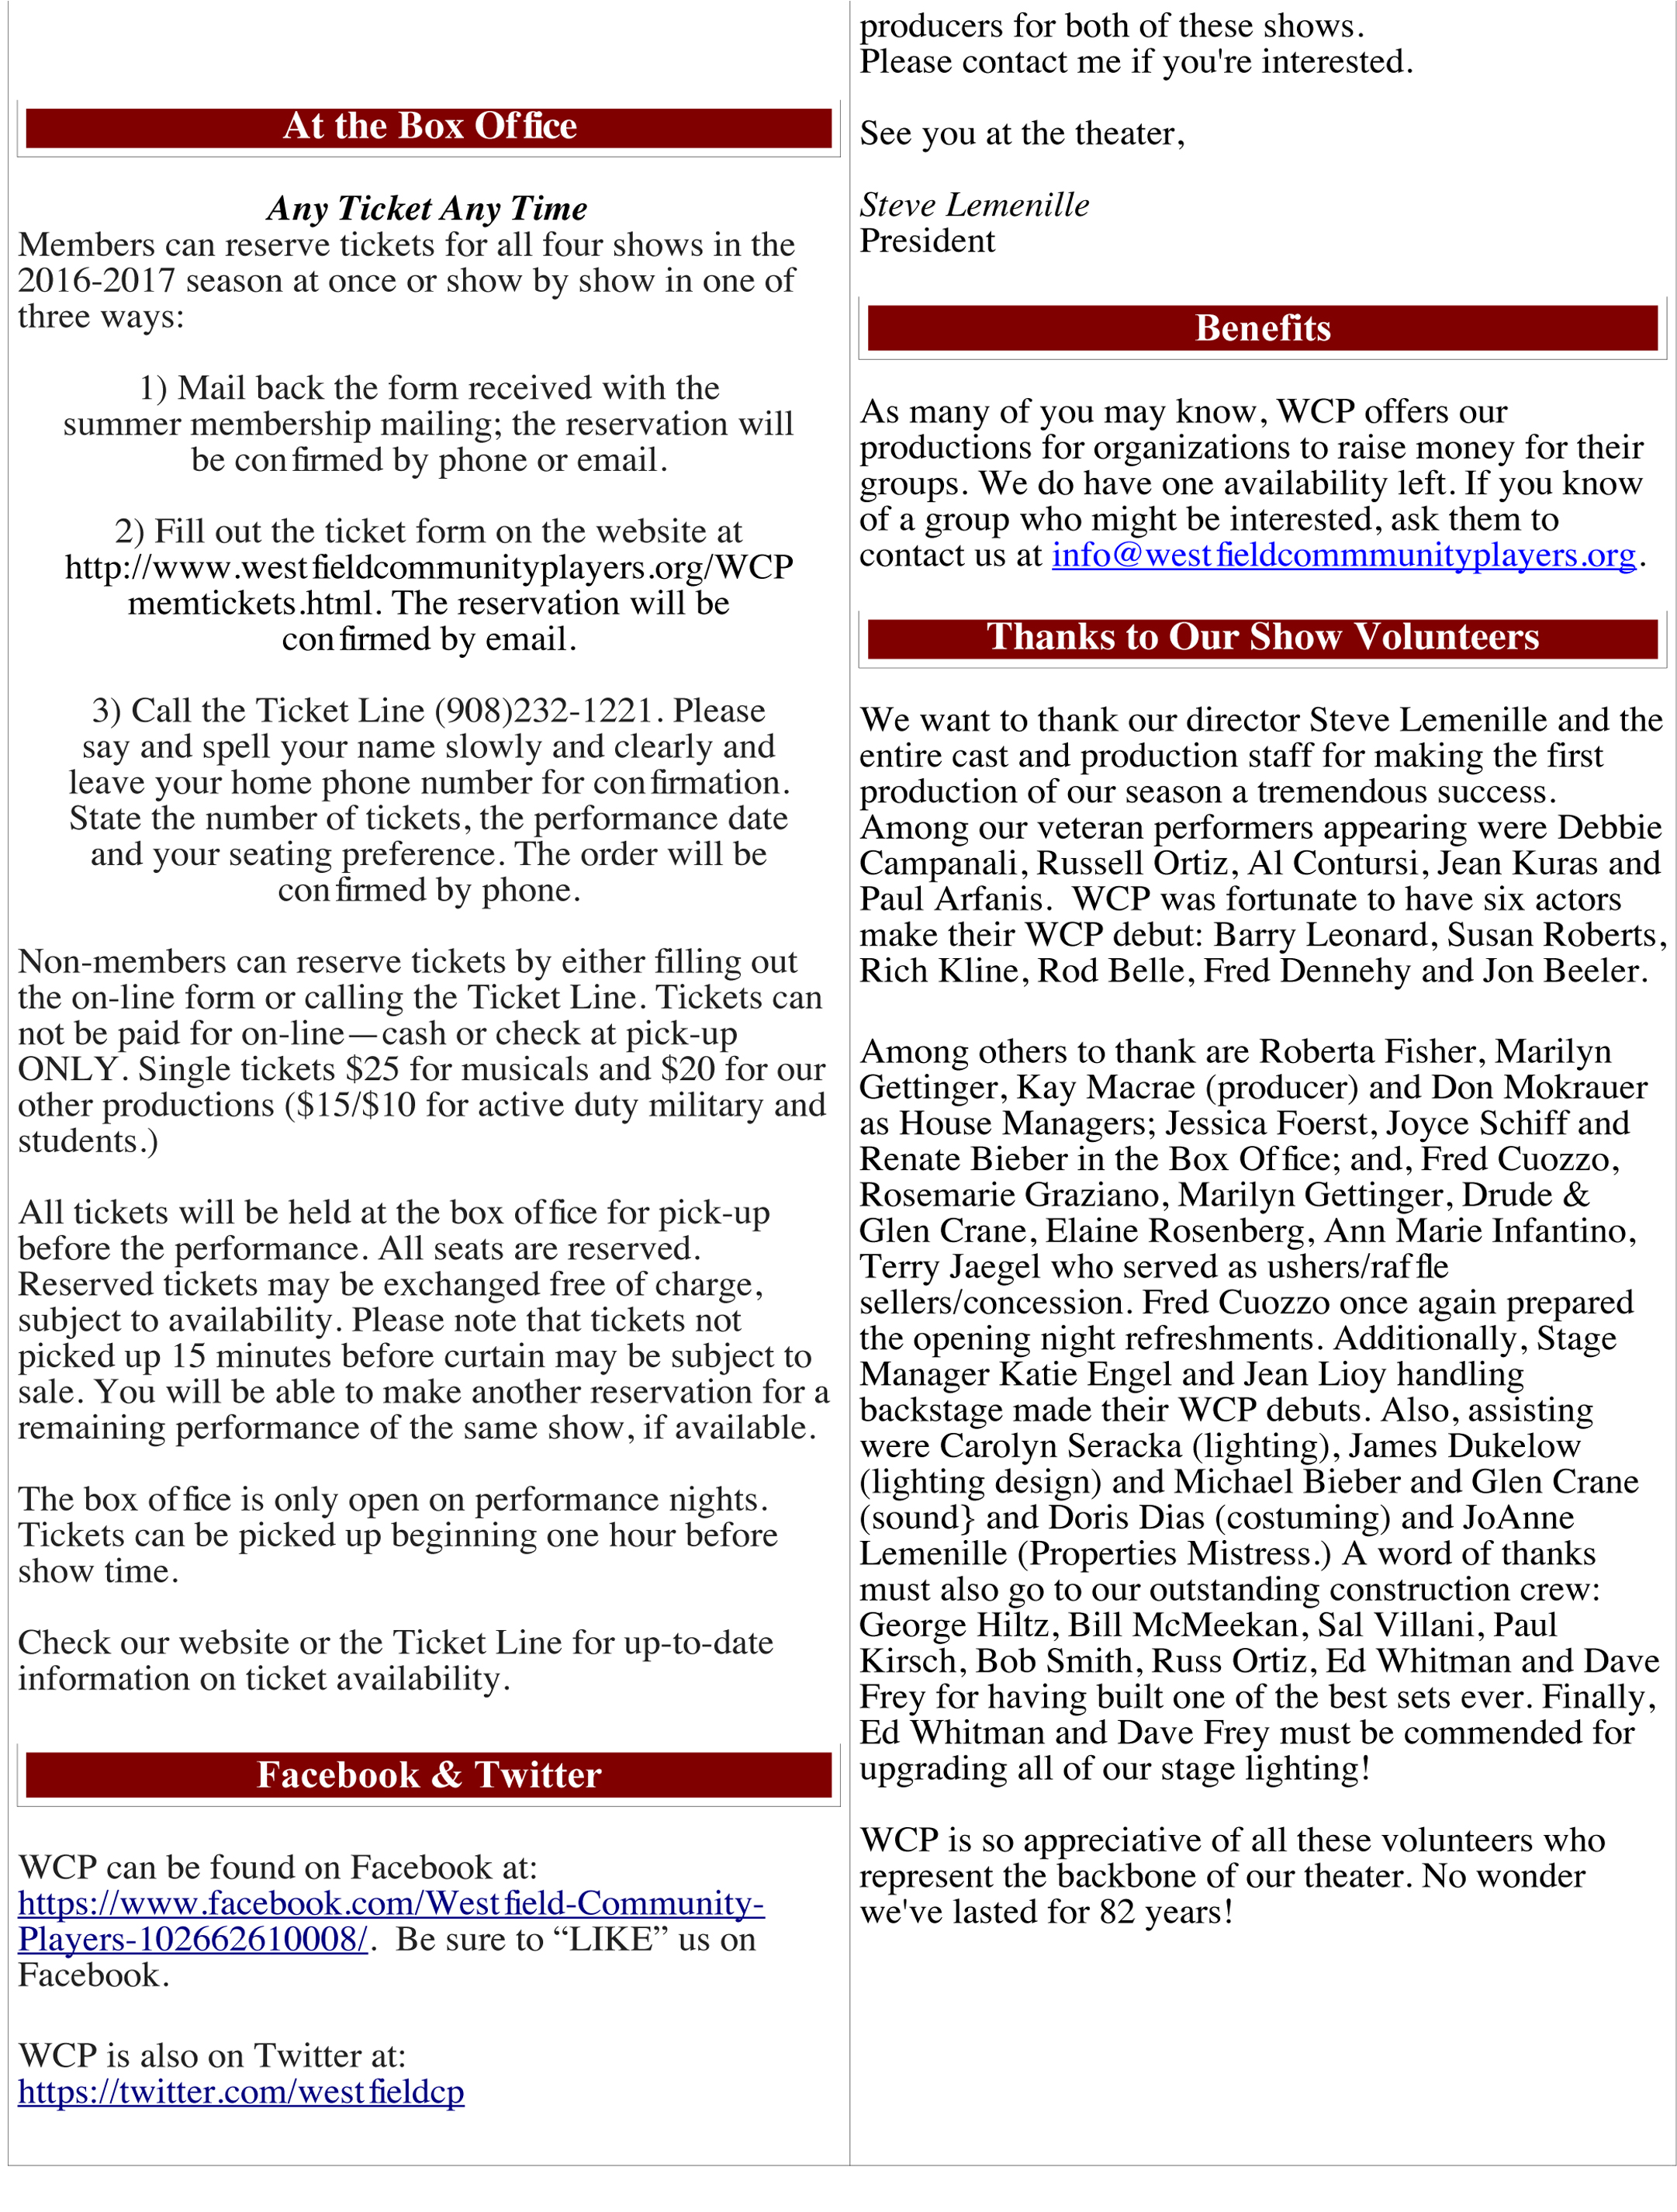 Westfield munity Players Newsletter